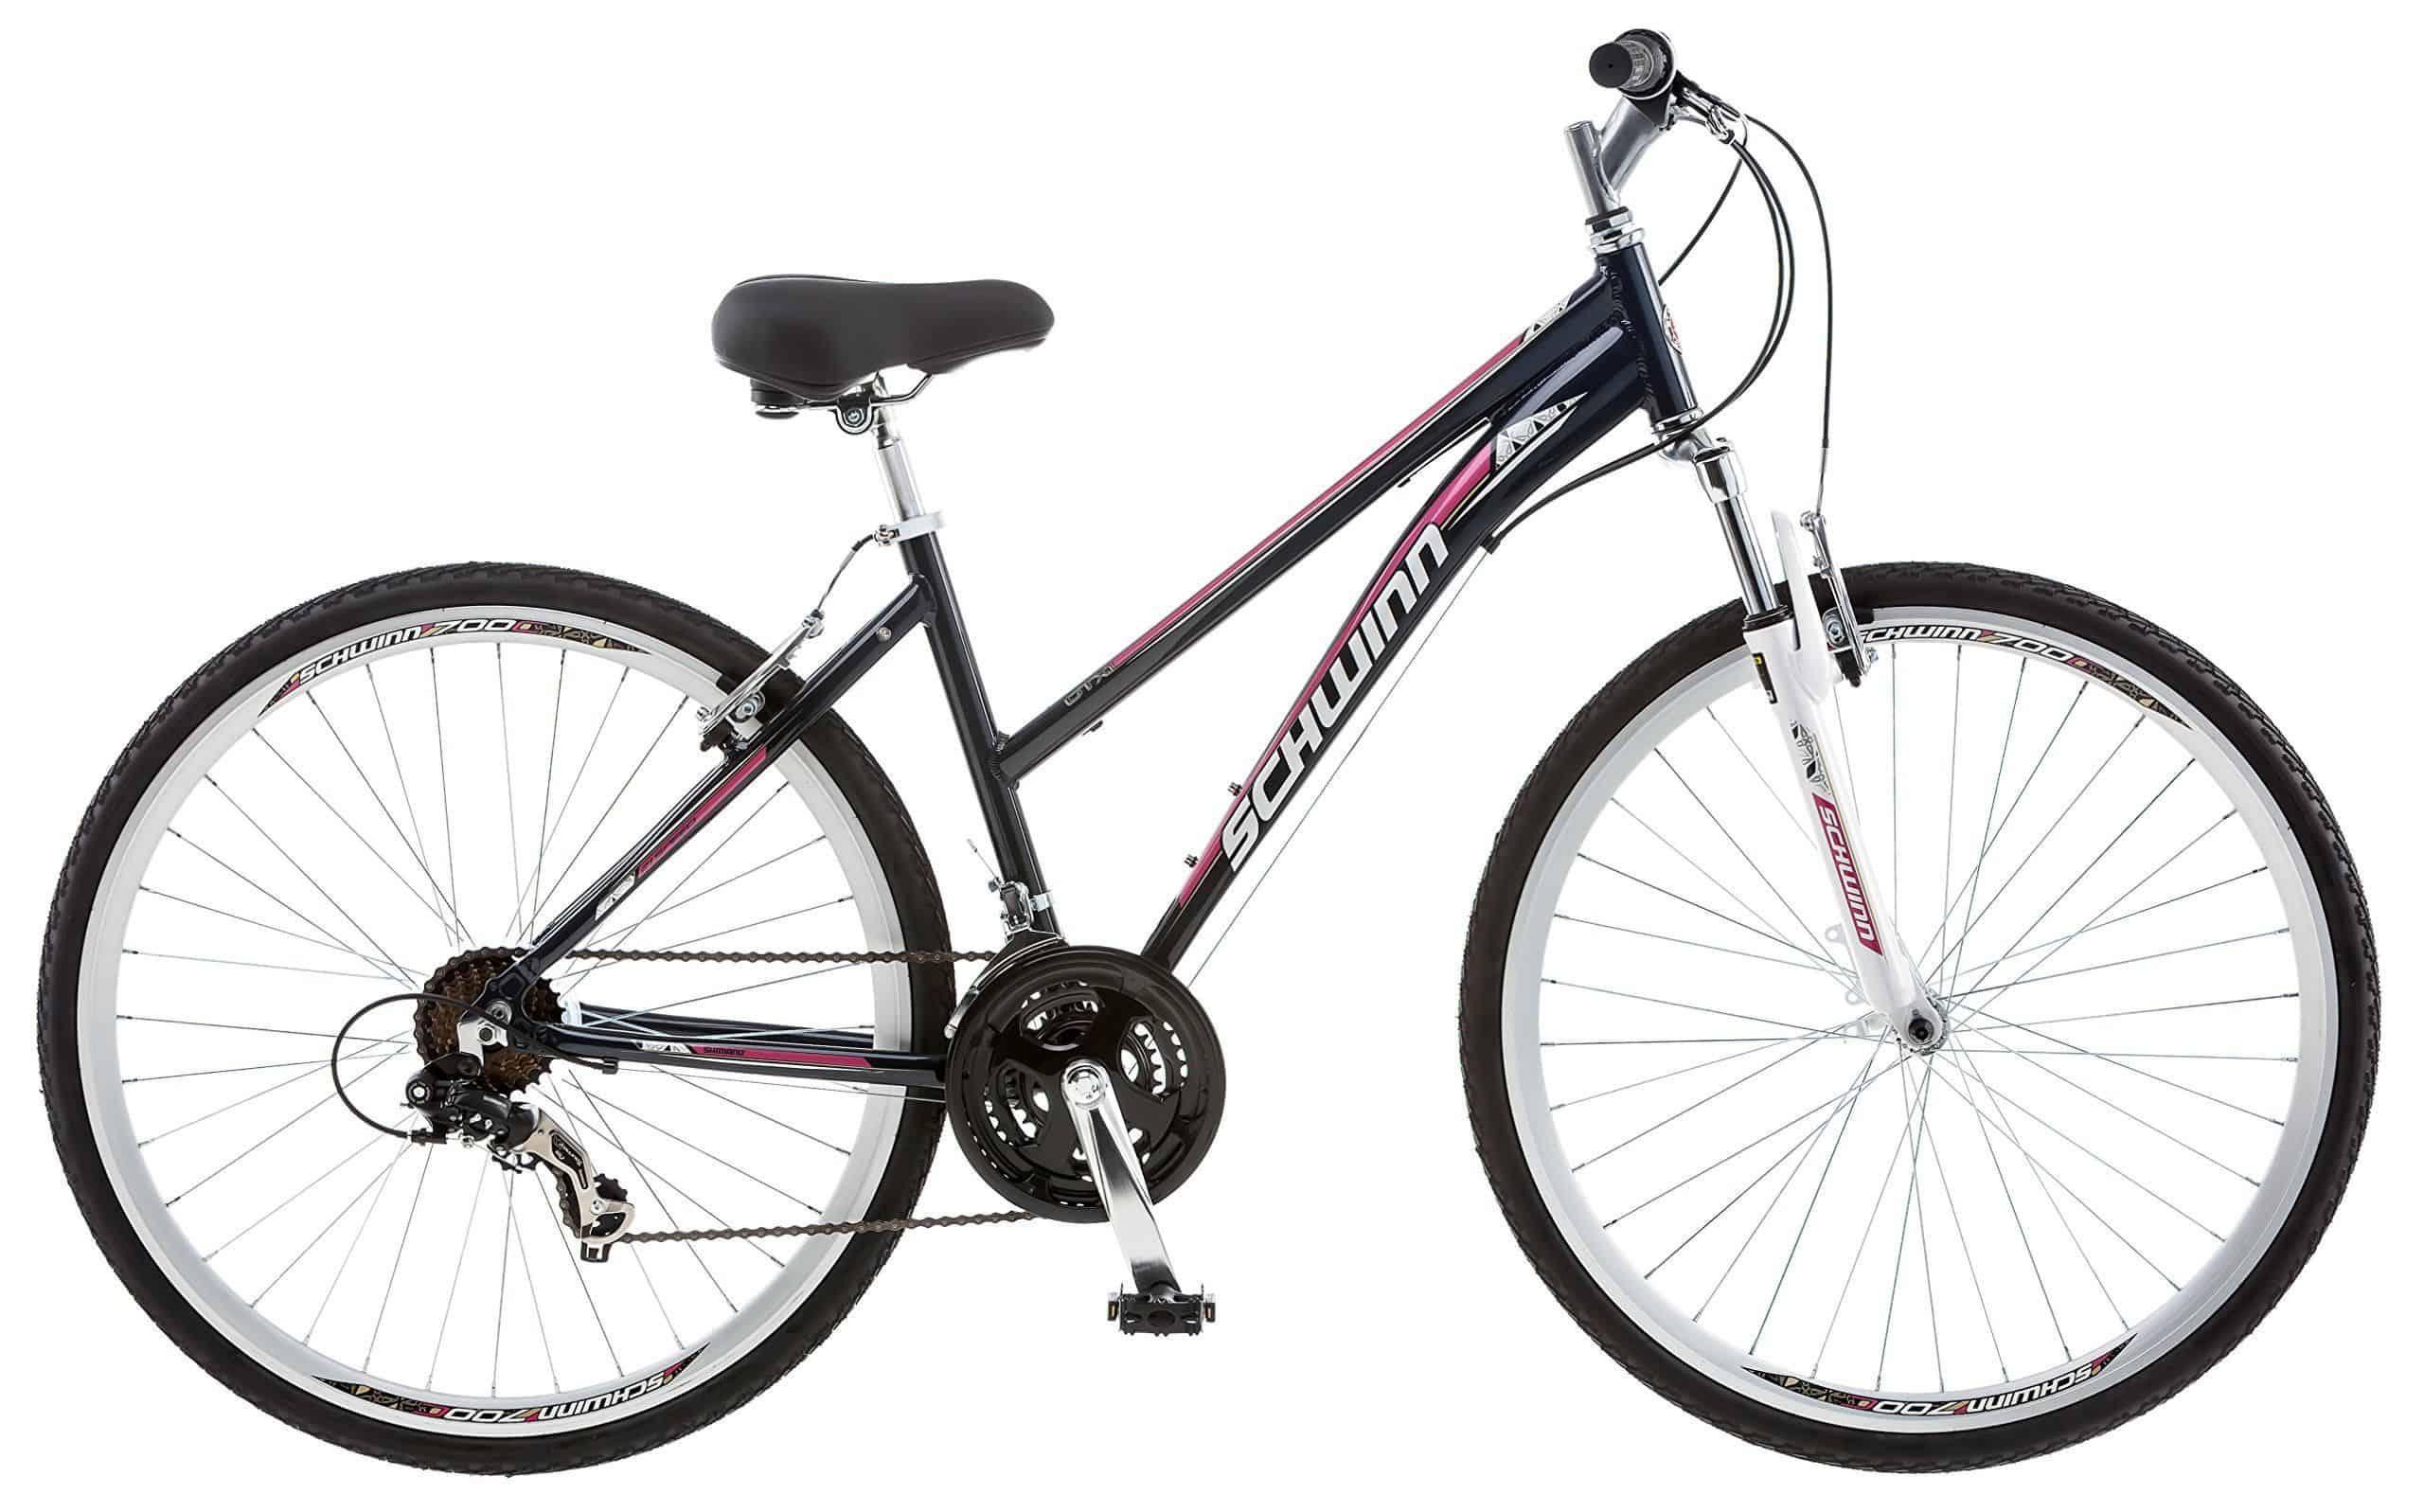 Schwinn GTX 1.0 Men's Dual Sport Bicycle